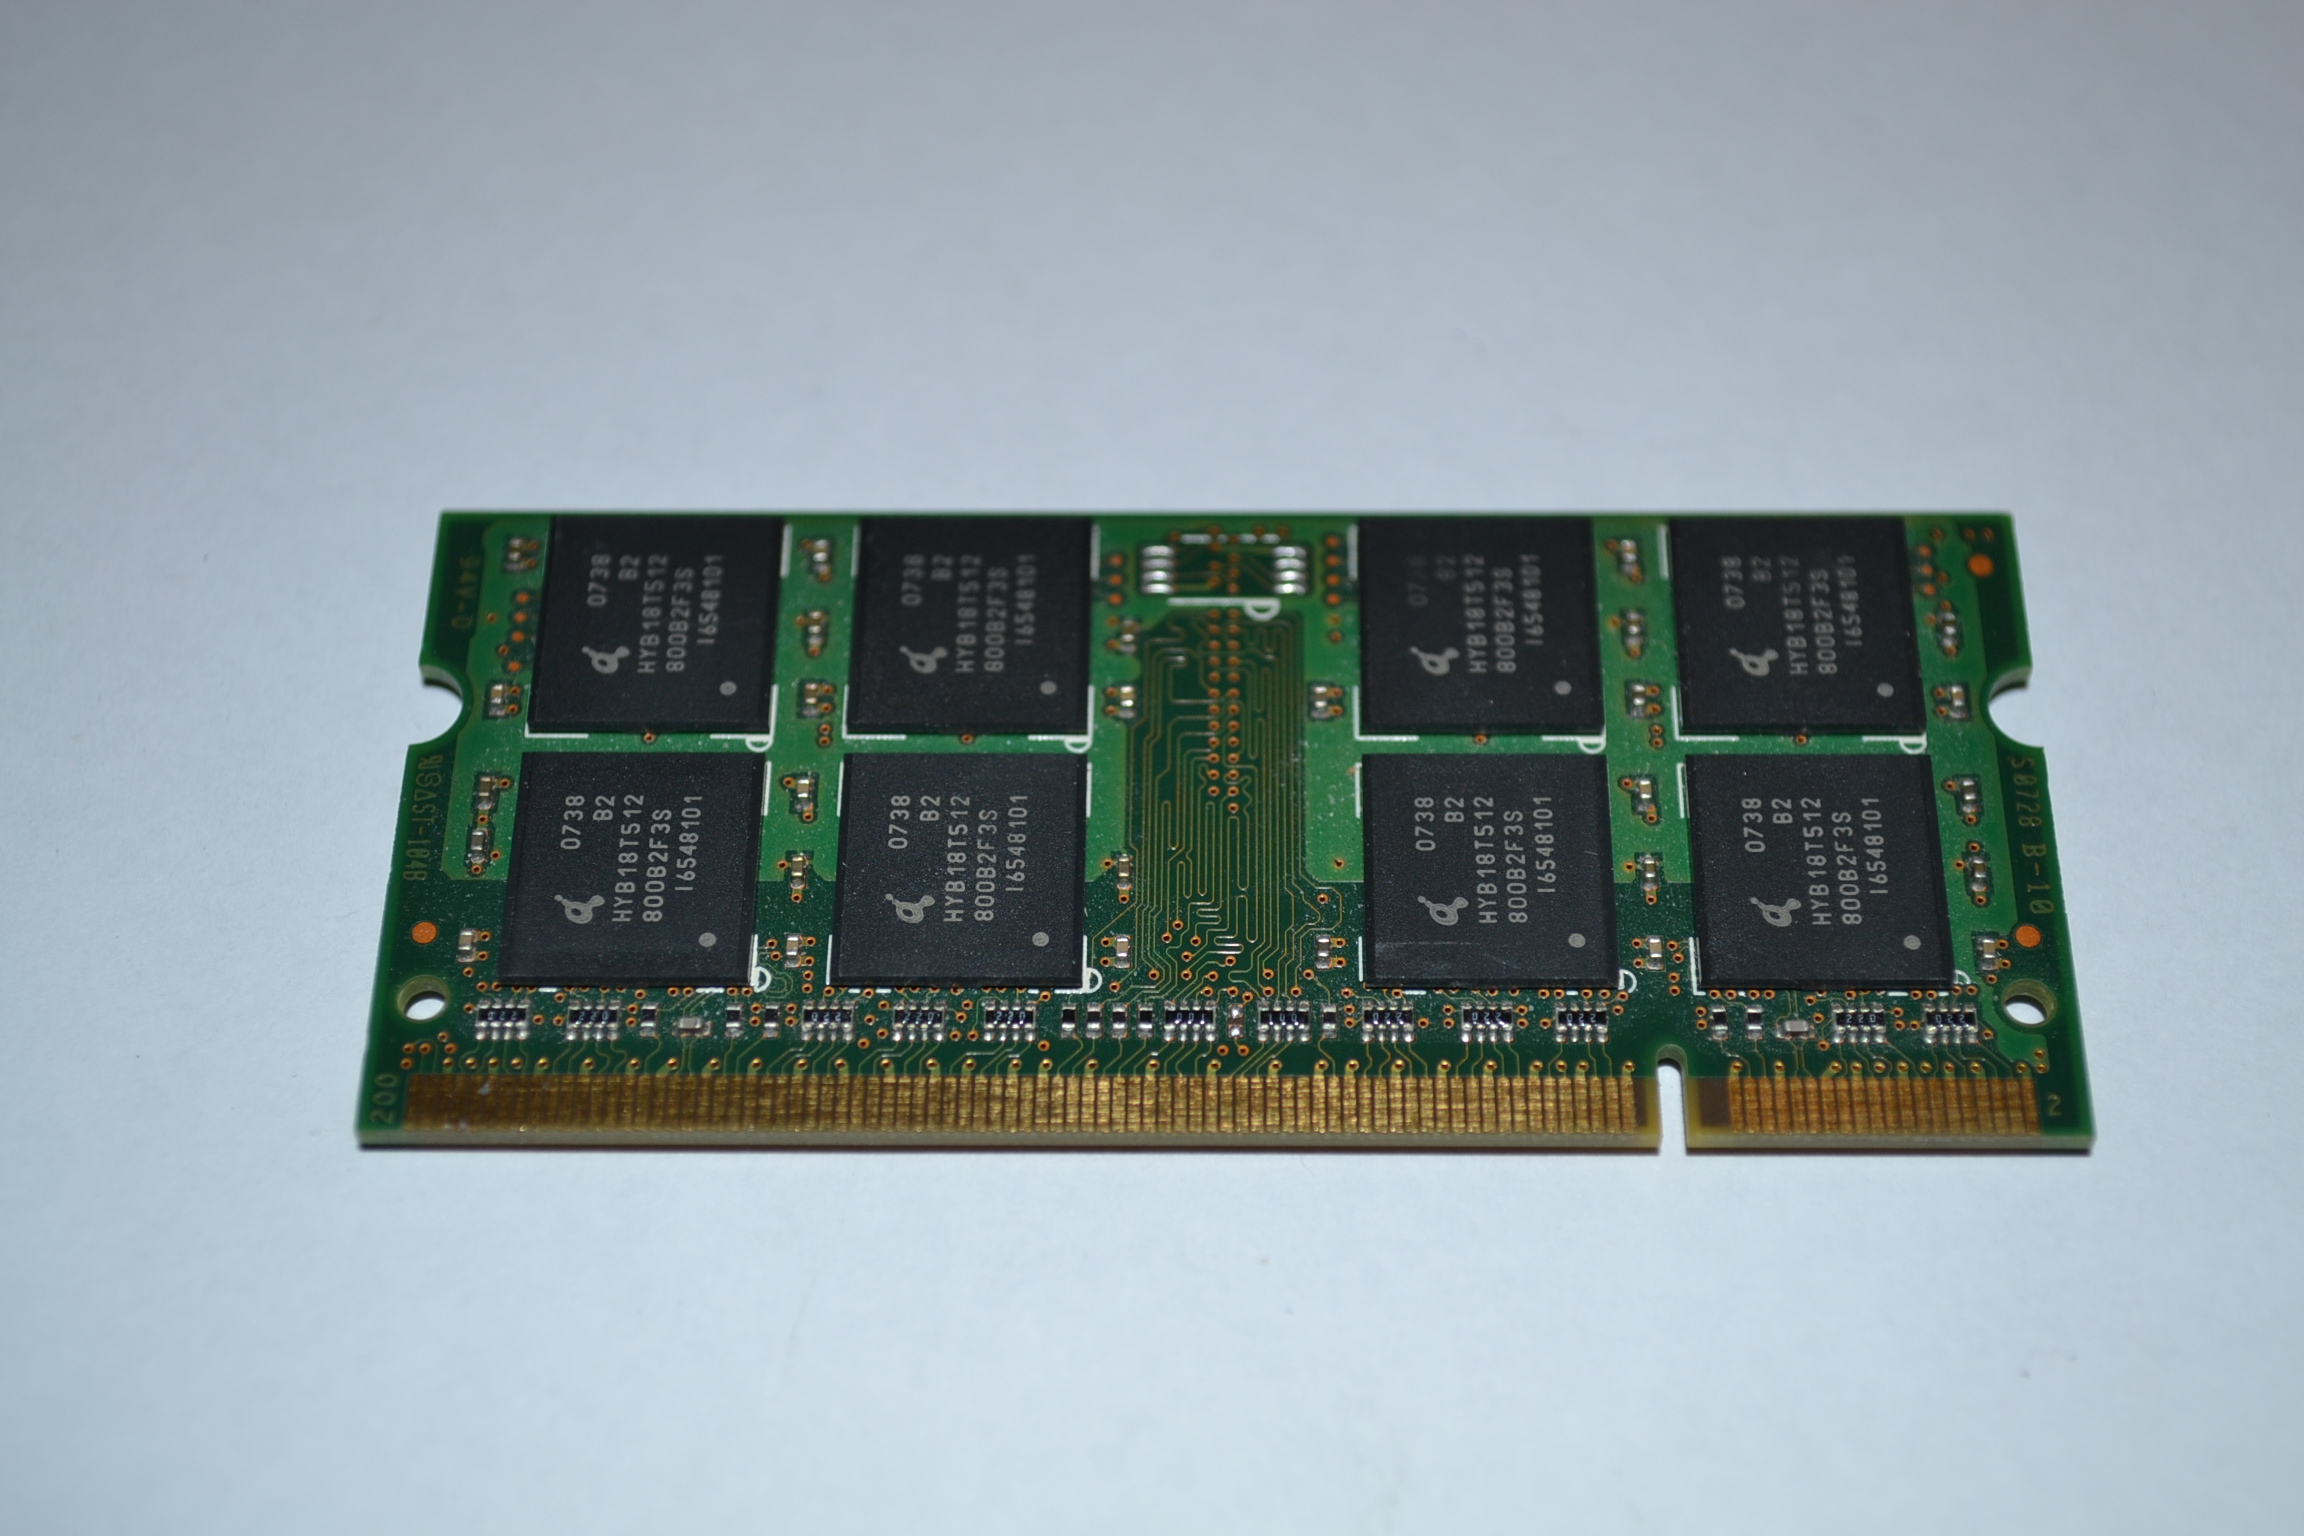 512MB DDR2 SODIMM 200PIN PC25300 667MHZ CL5 Infineon HYS64T64020HDL3SB